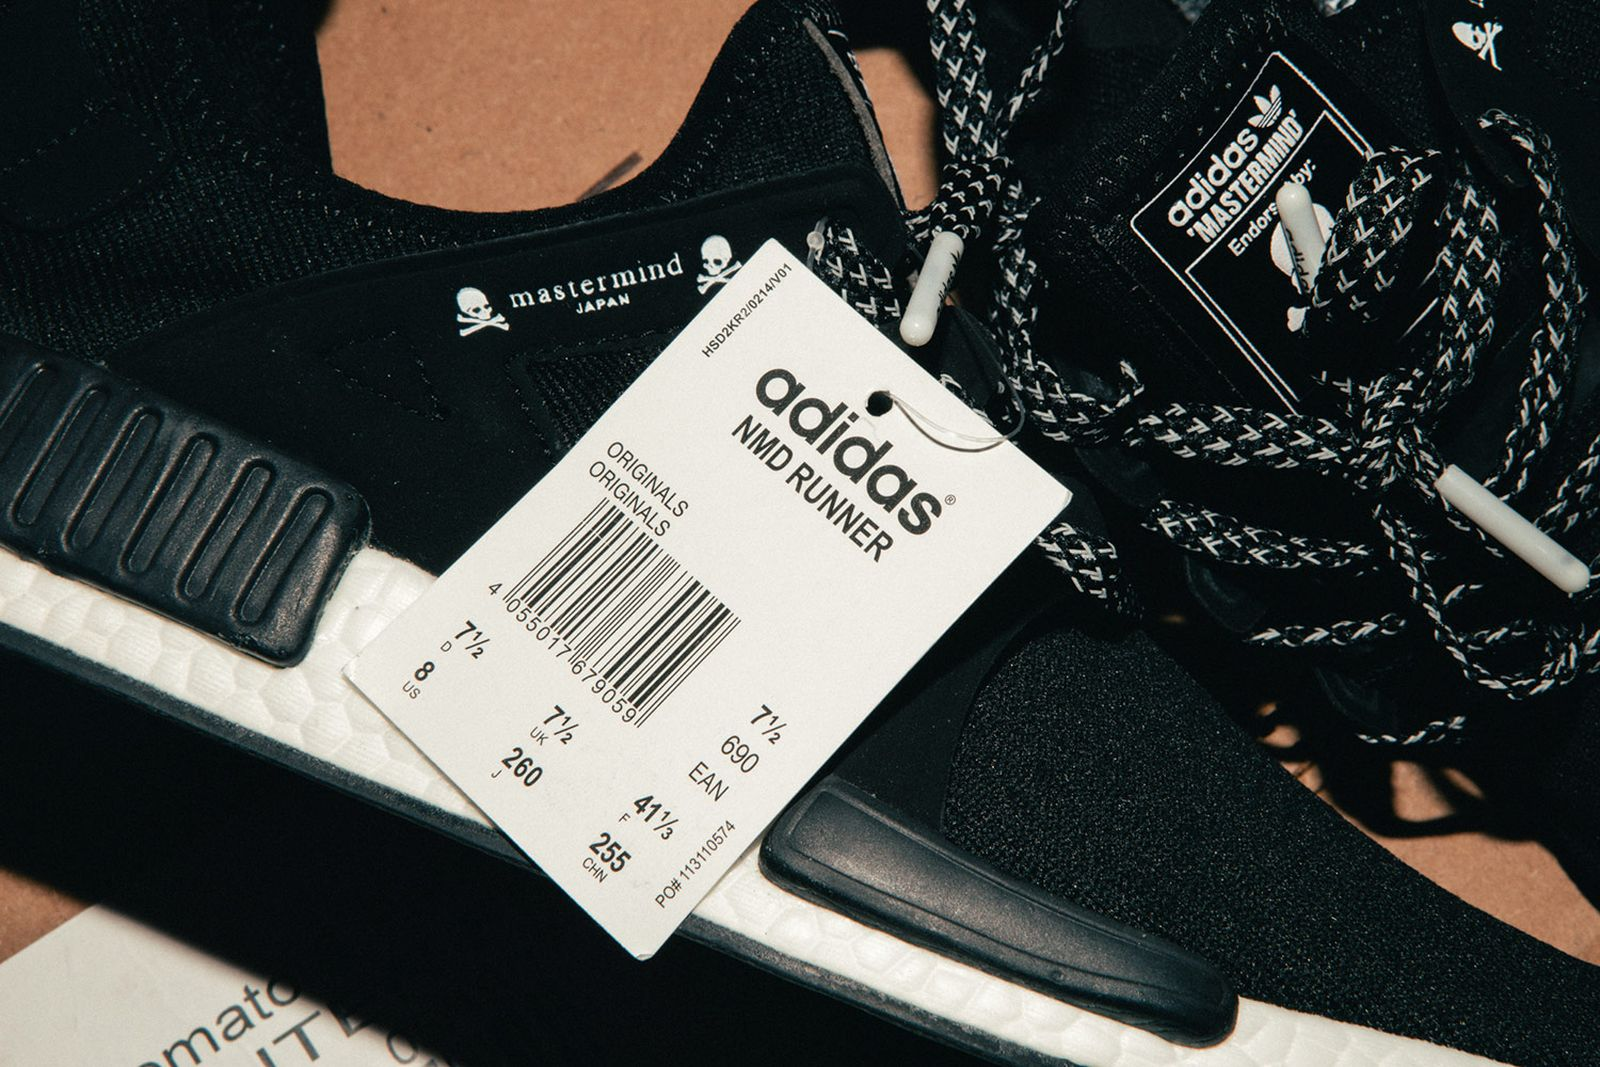 Legit-Check-Fake-Sneakers-Highsnobiety-17